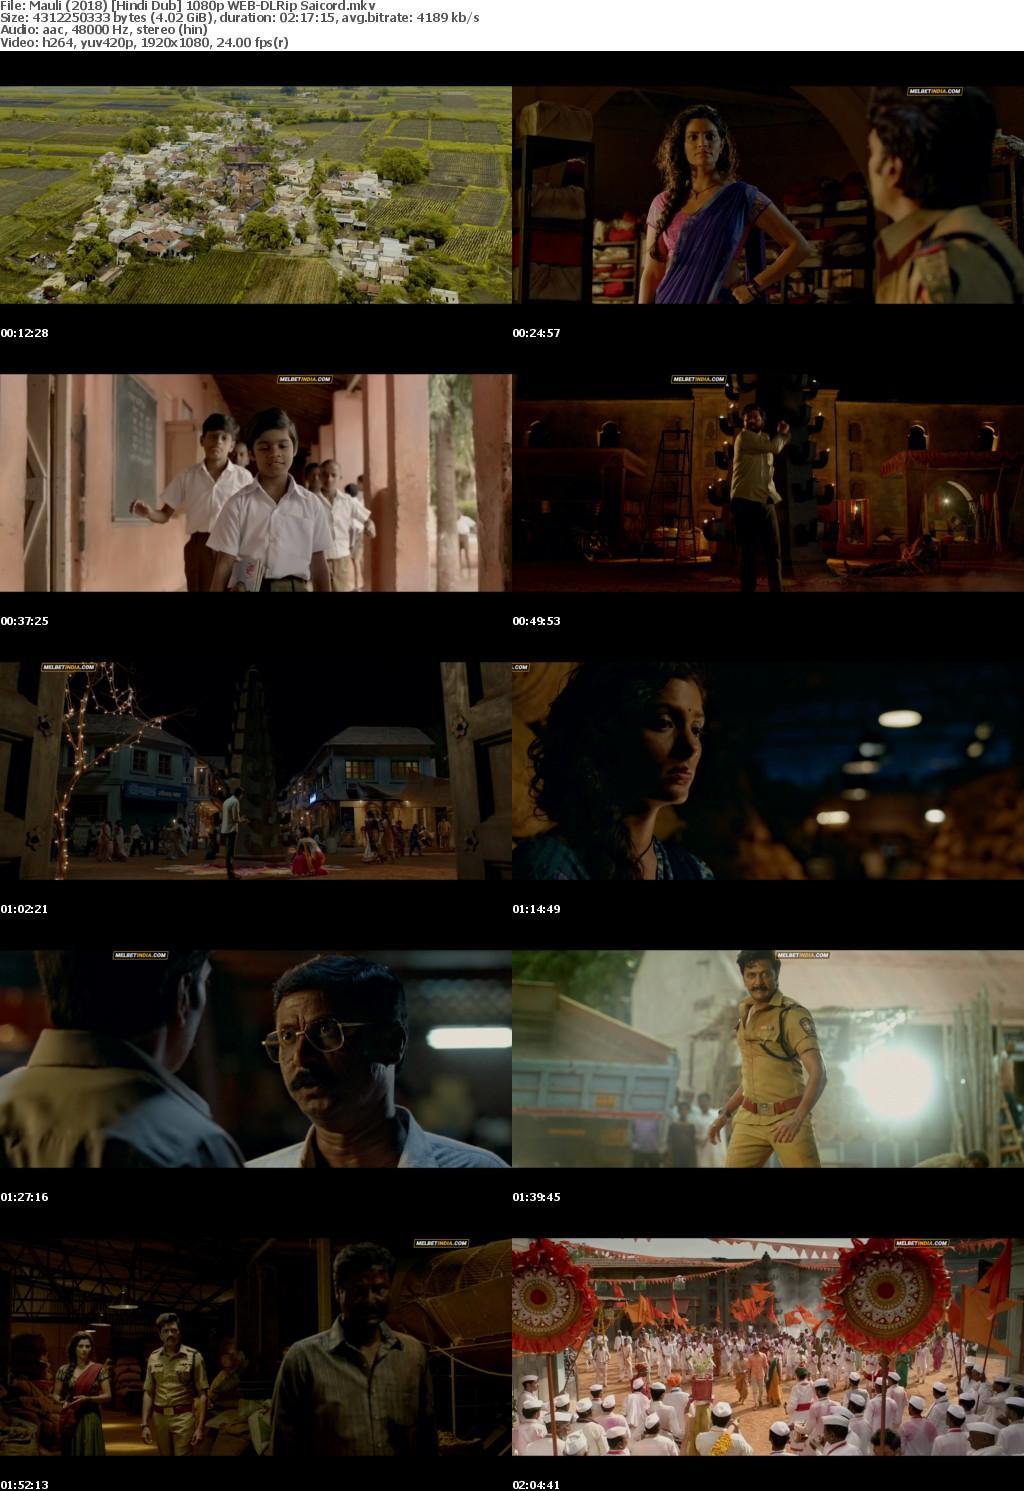 Mauli (2018) Hindi Dub 1080p WEB-DLRip Saicord